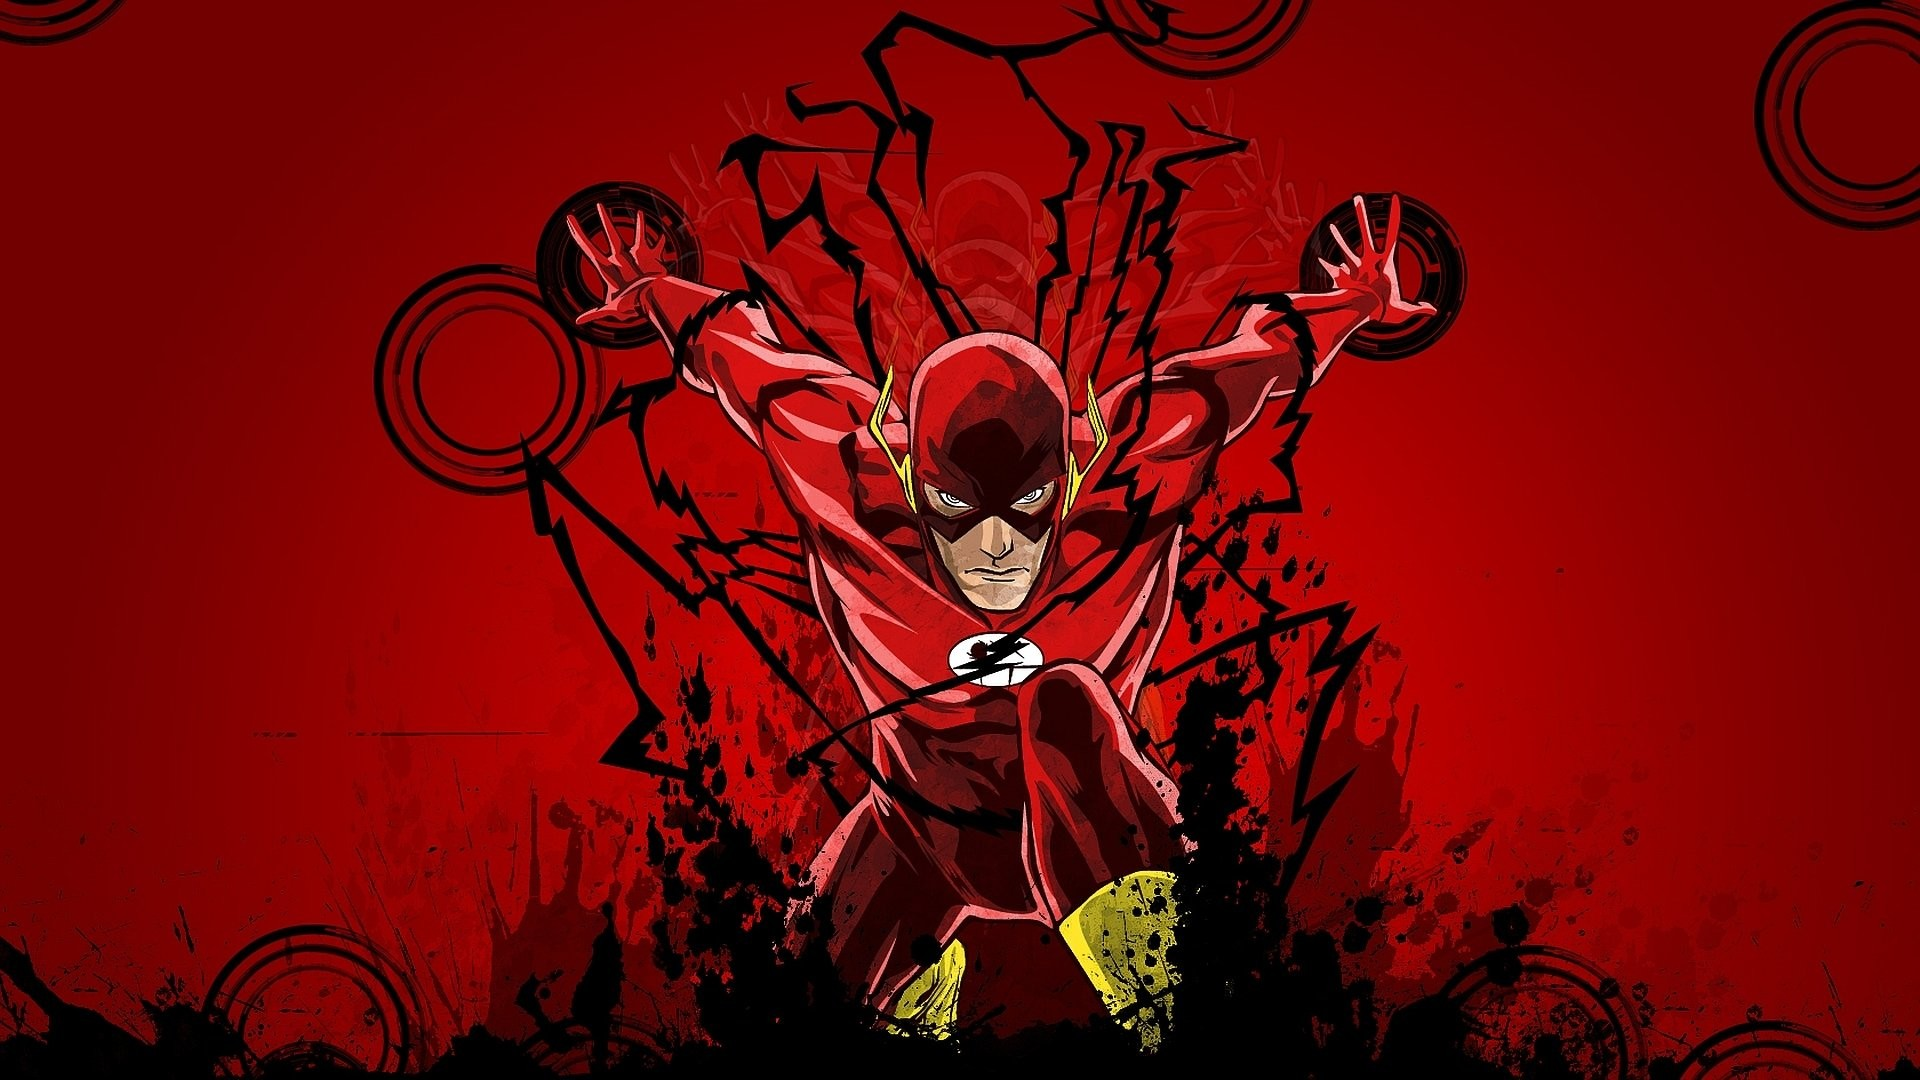 Hd wallpaper superhero - 1920x1080 Hd Wallpaper Background Id 540367